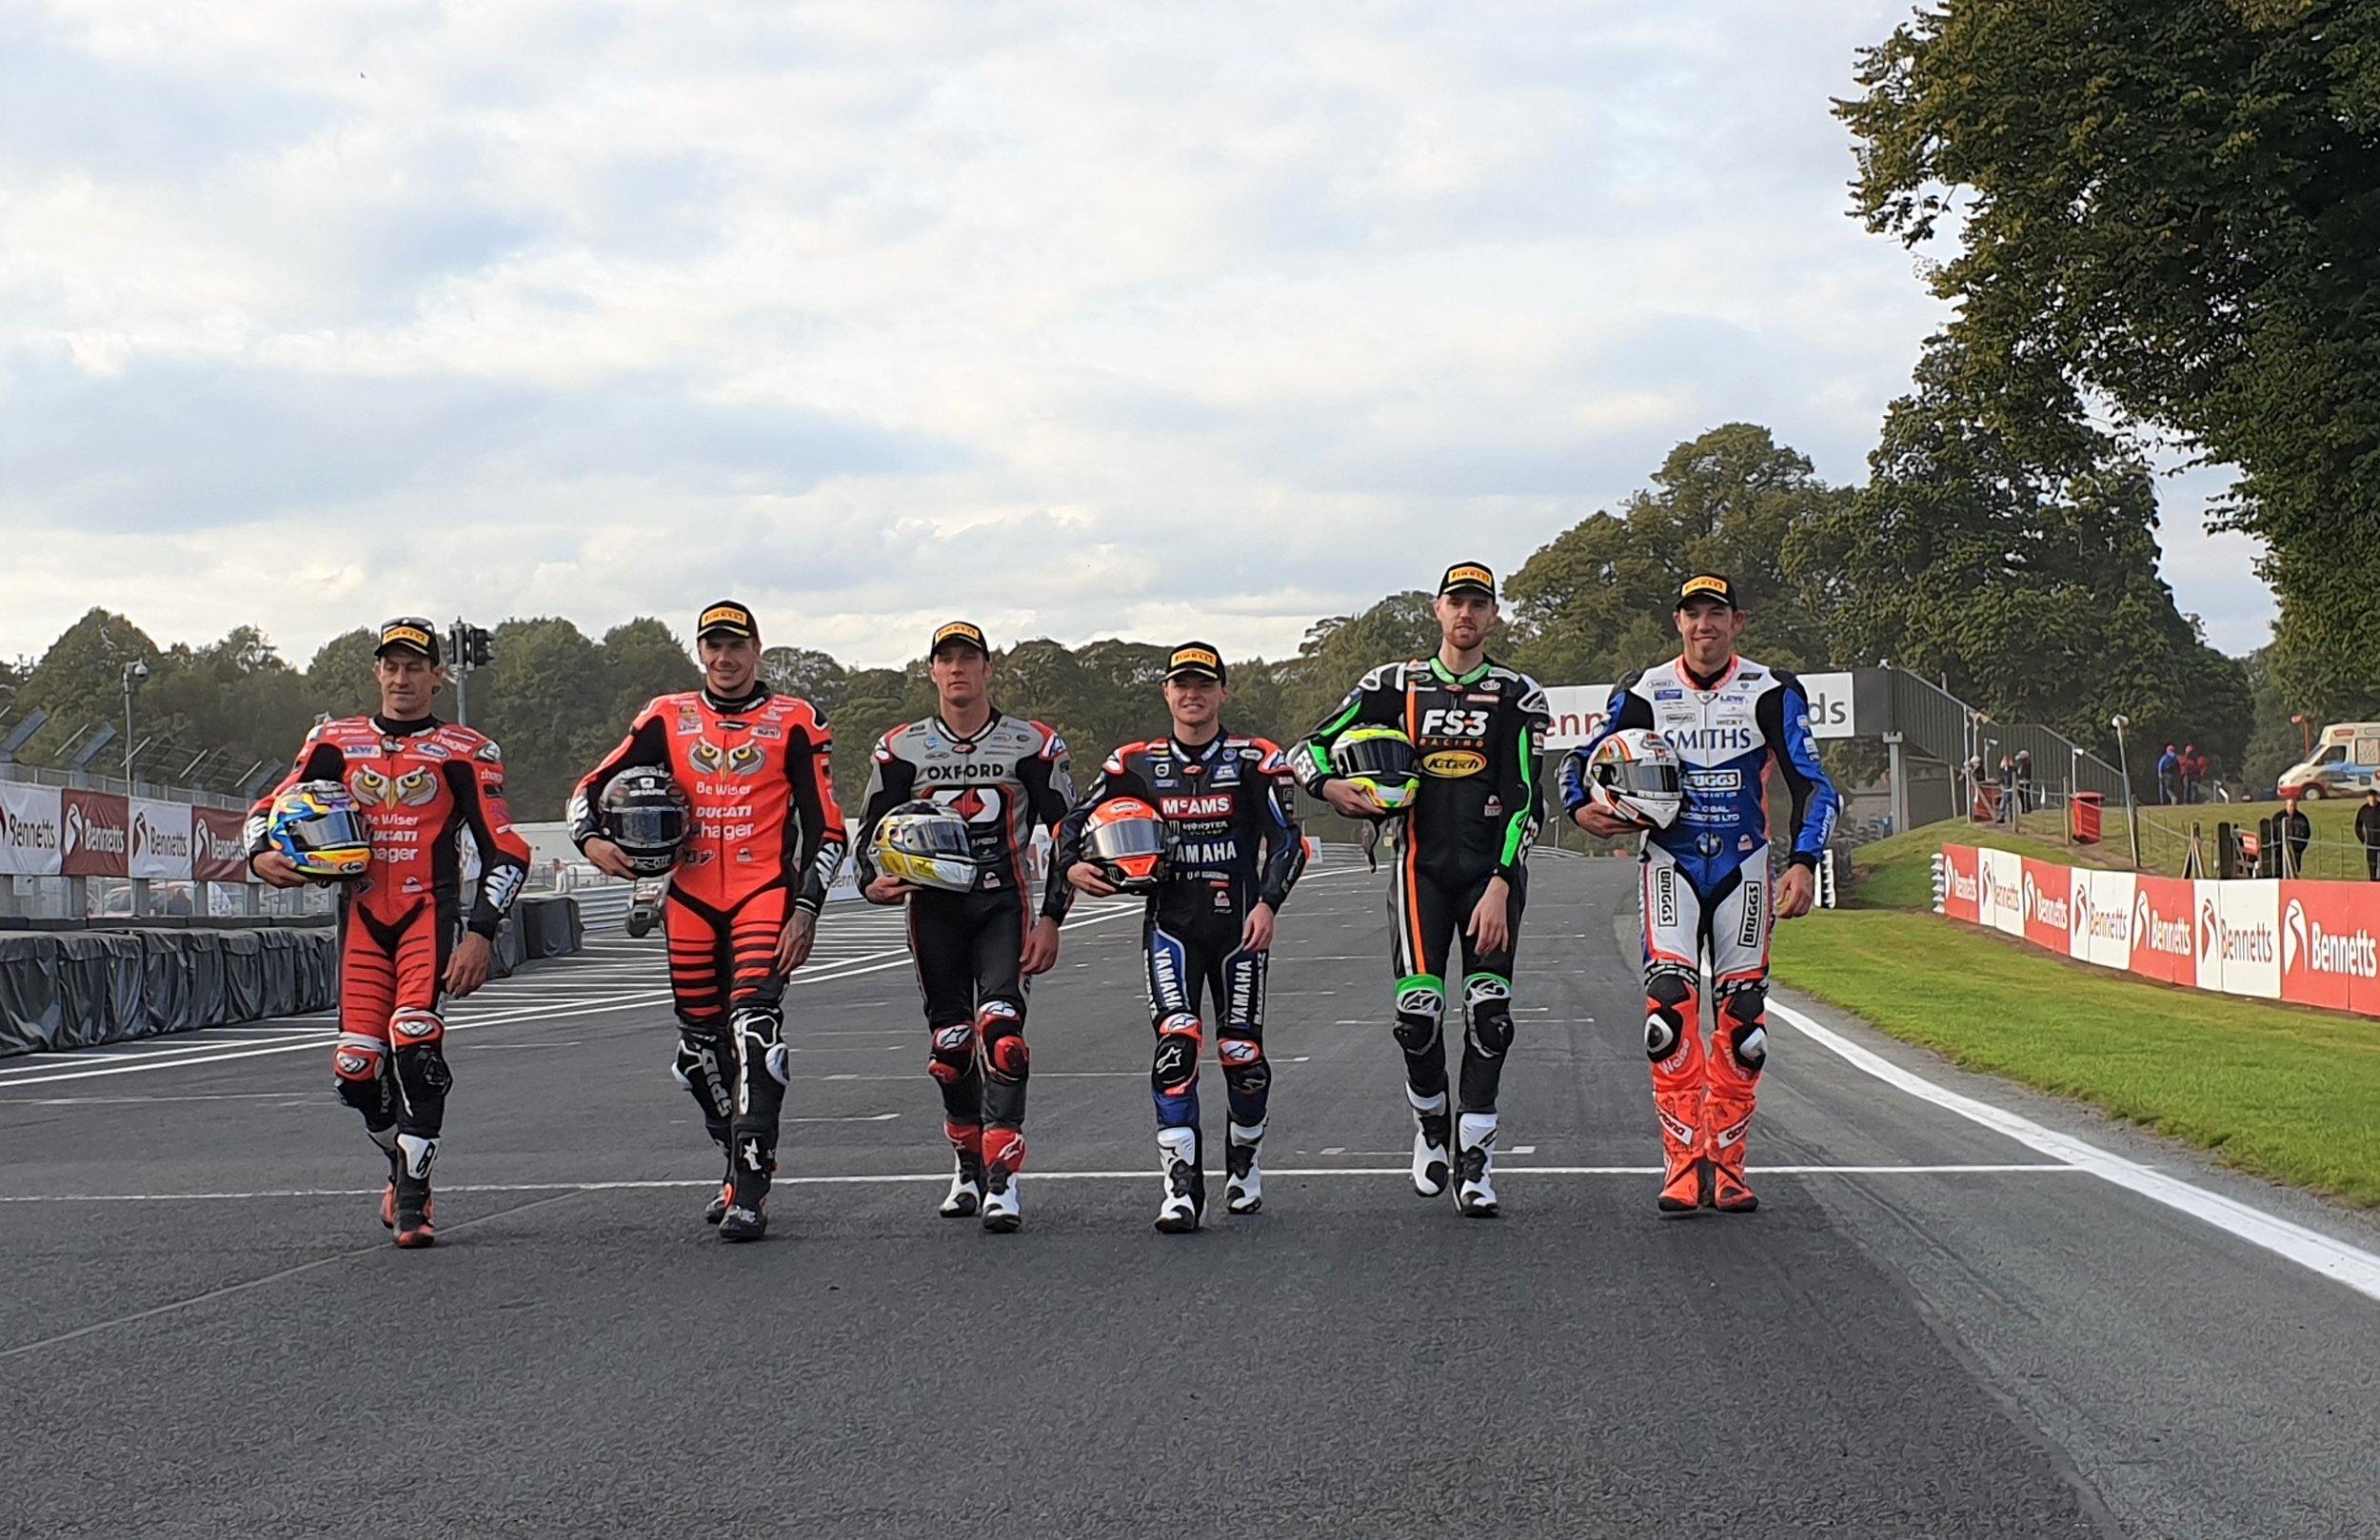 BSB Showdown riders confirmed